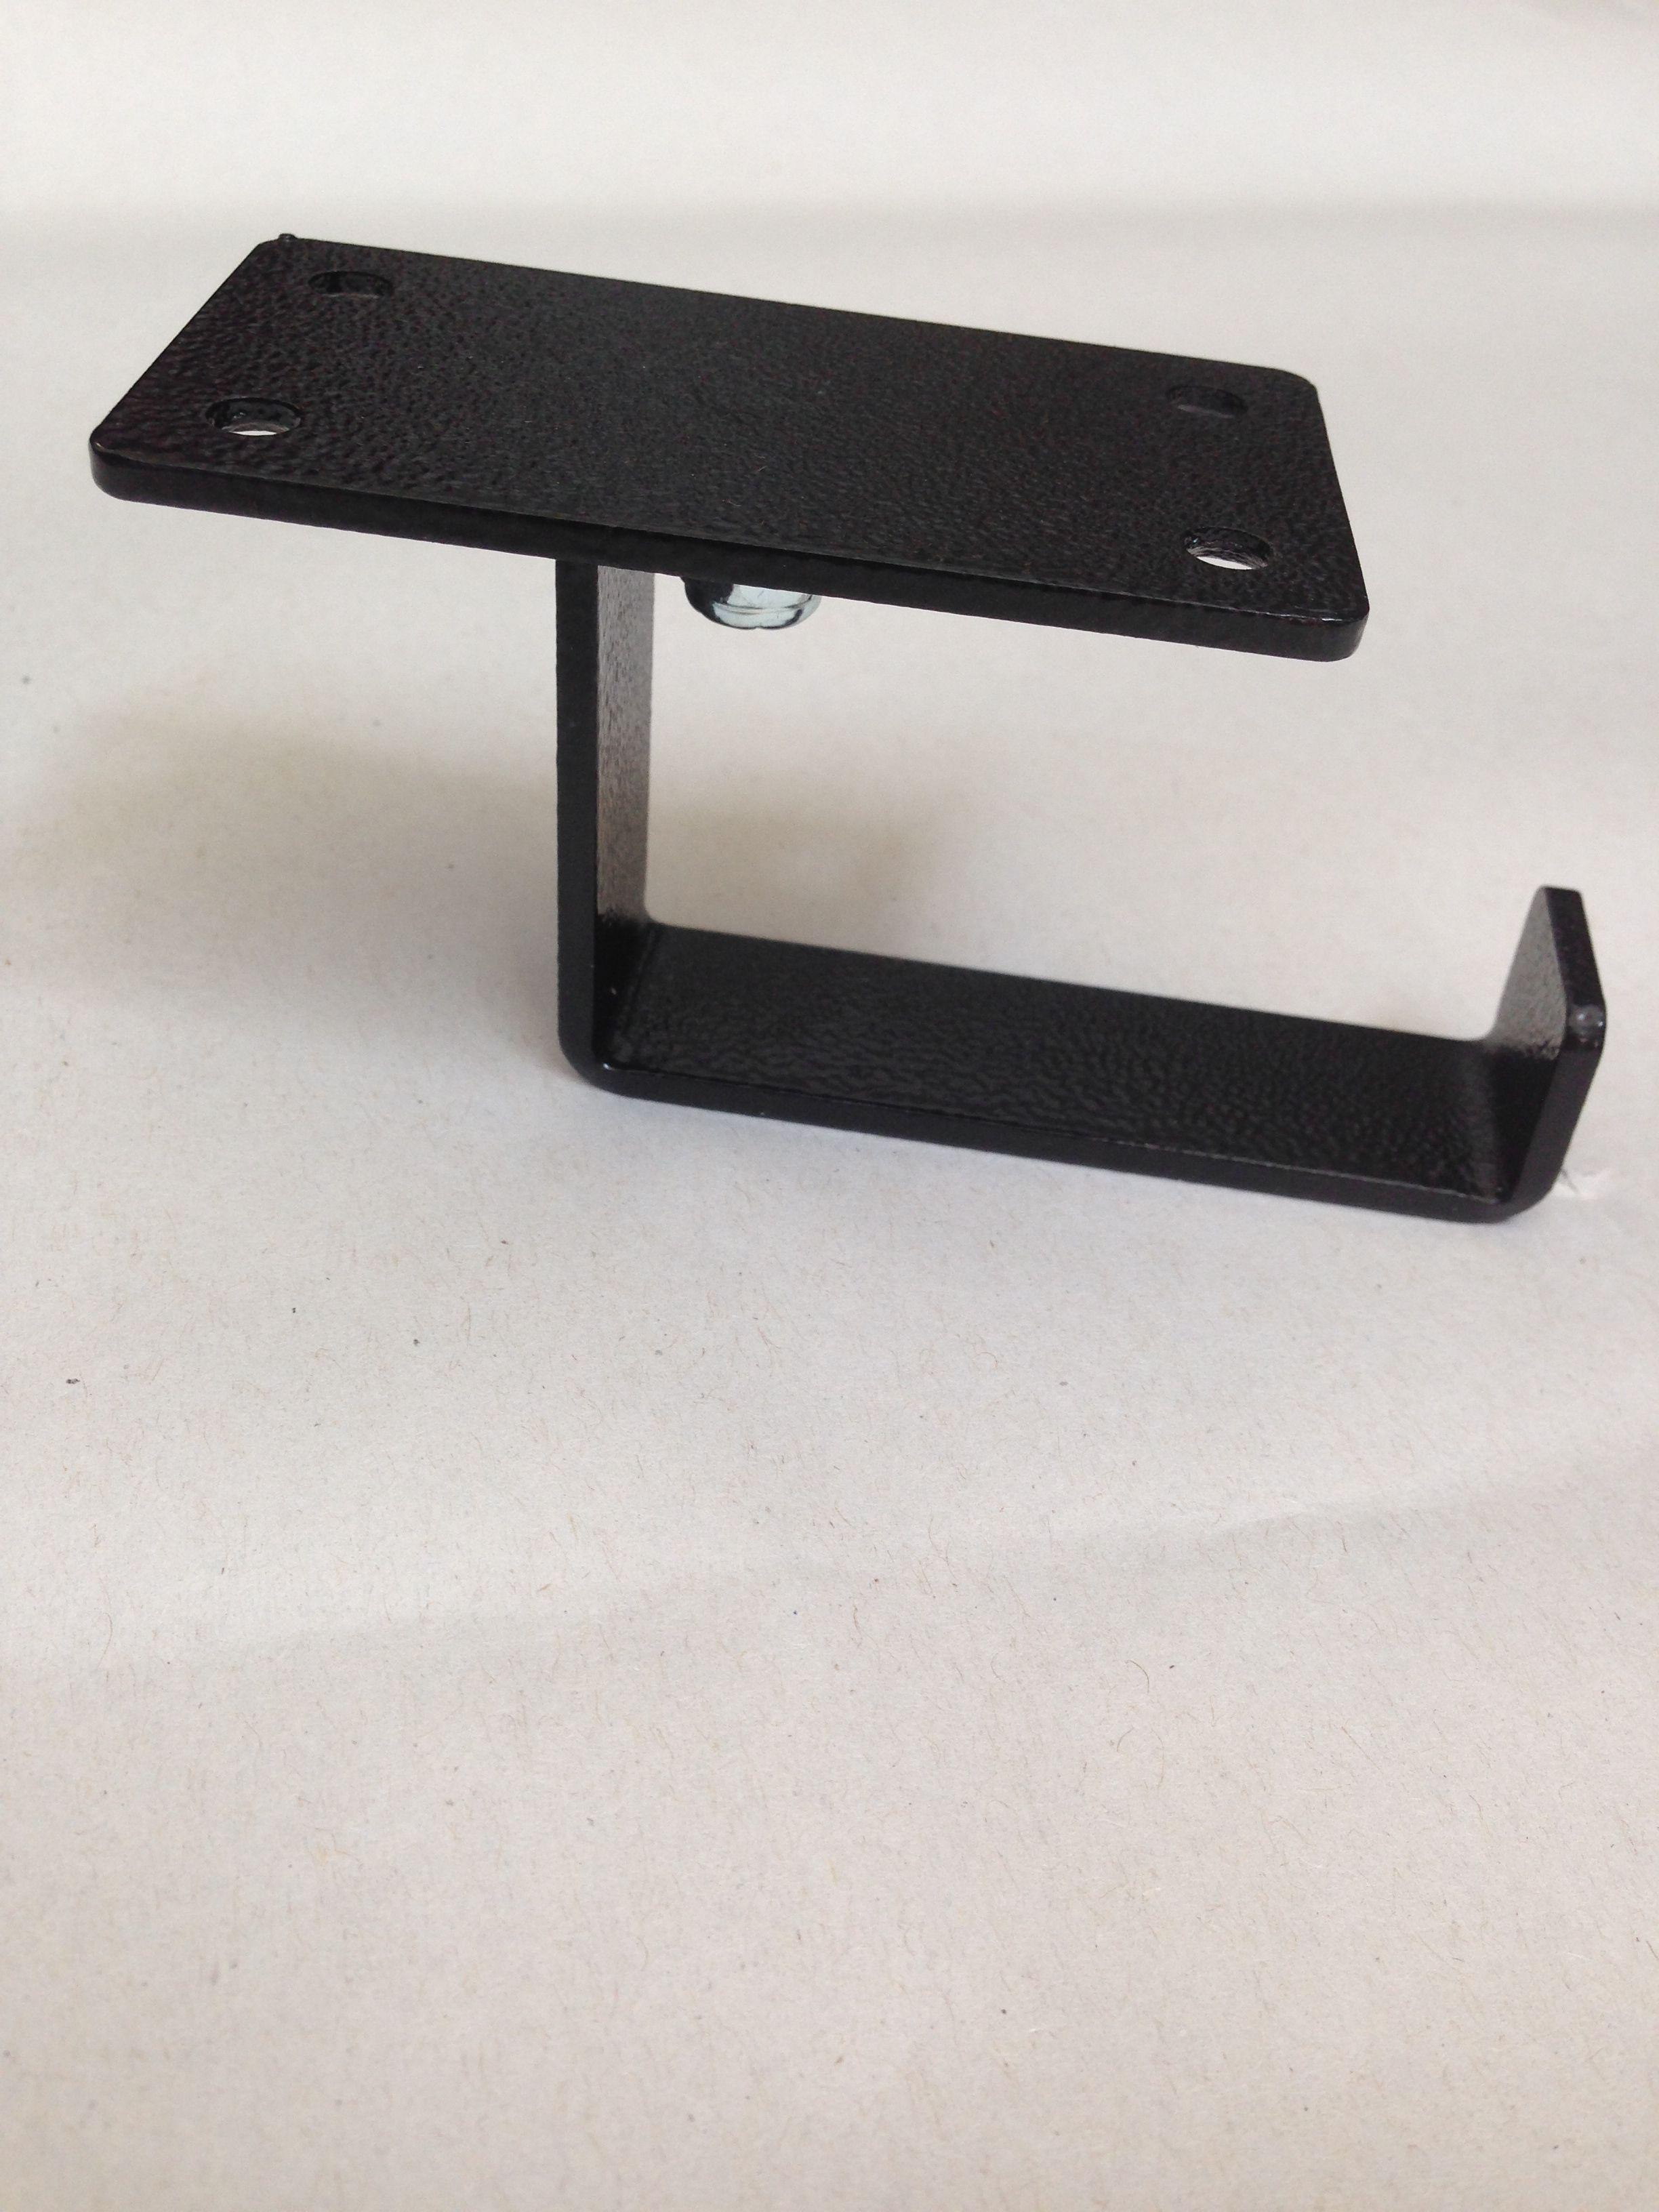 HUMPhooks   Table, Coffee table, Table top